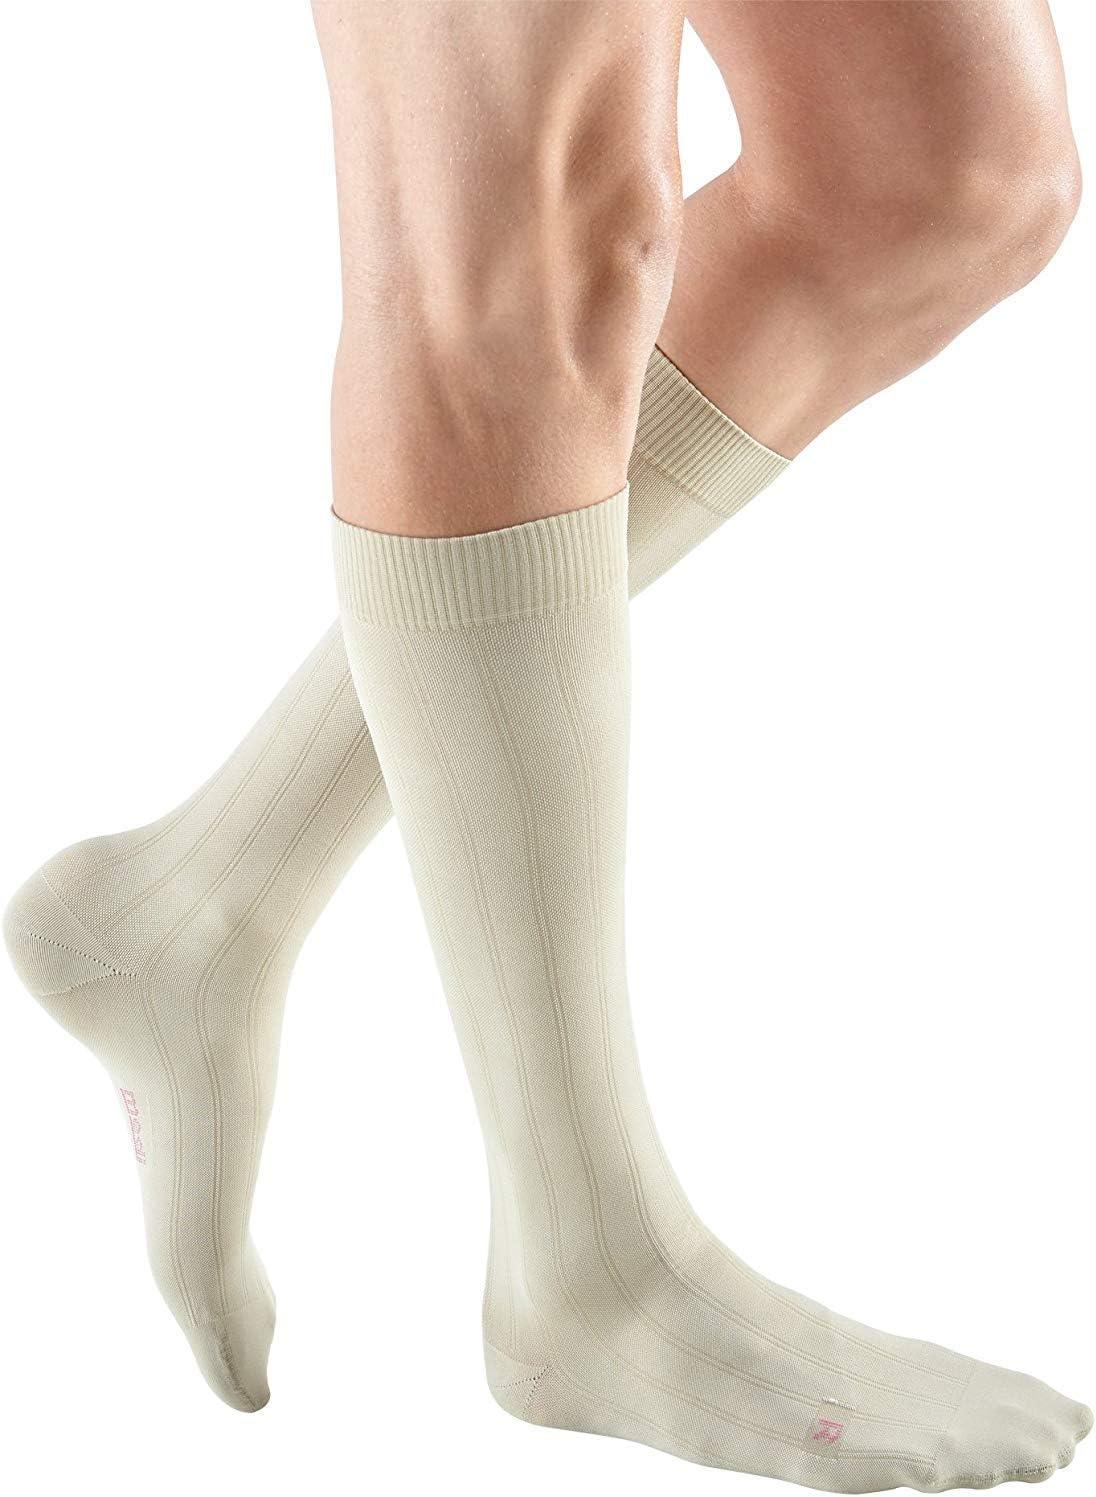 Calf High Compression Stockings mediven for Men Classic Closed Toe 15-20 mmHg